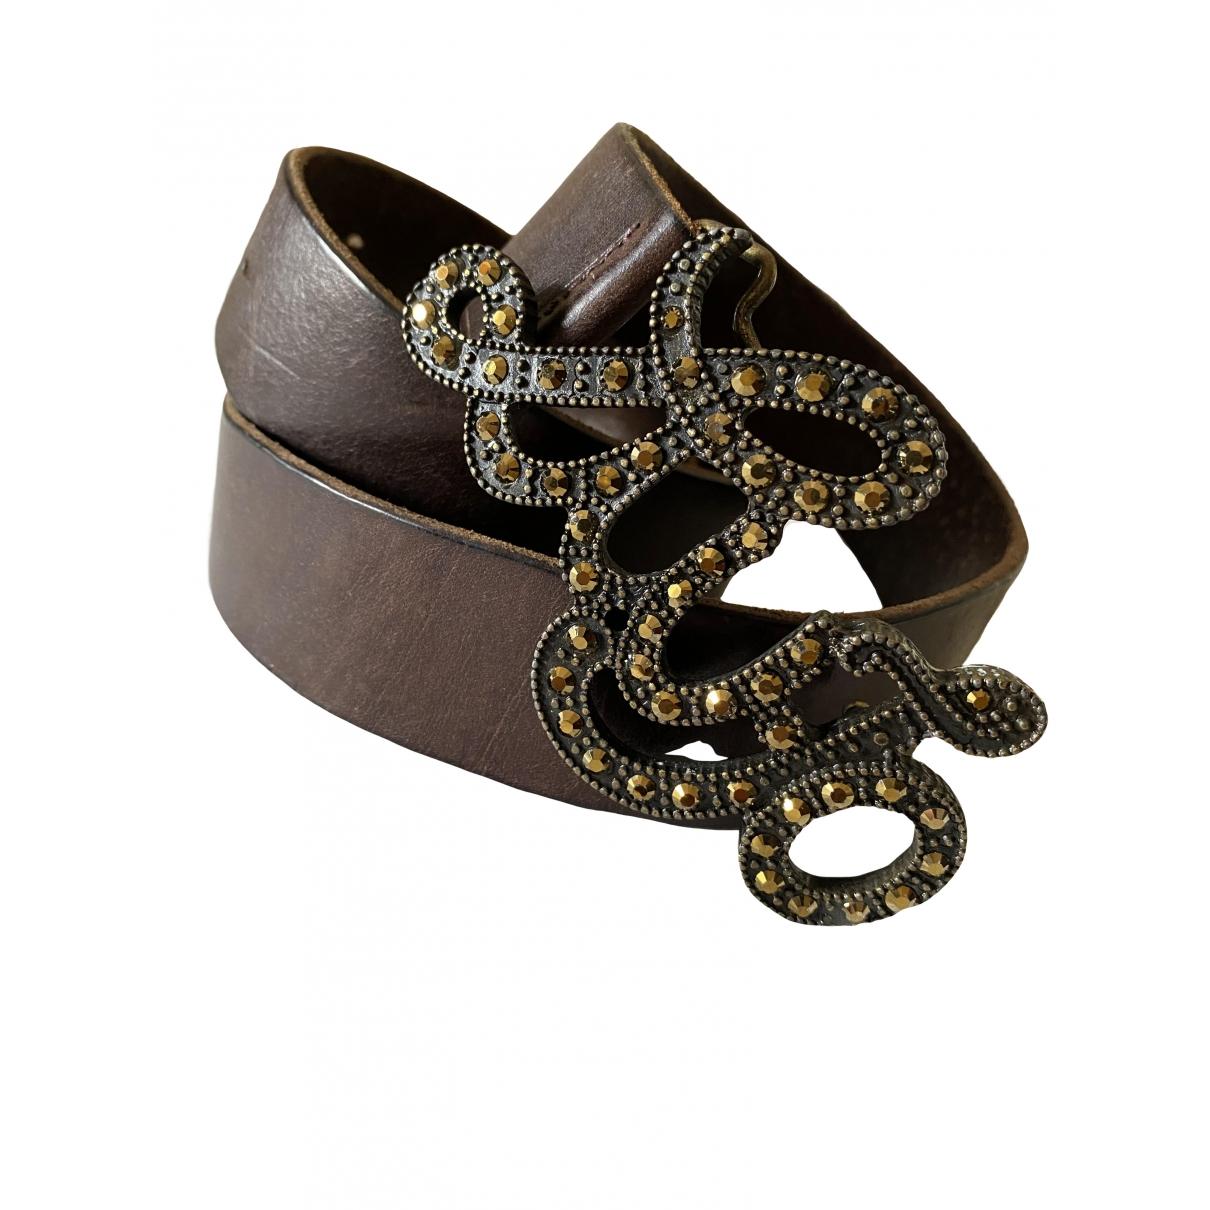 Cinturon de Cuero Liu.jo